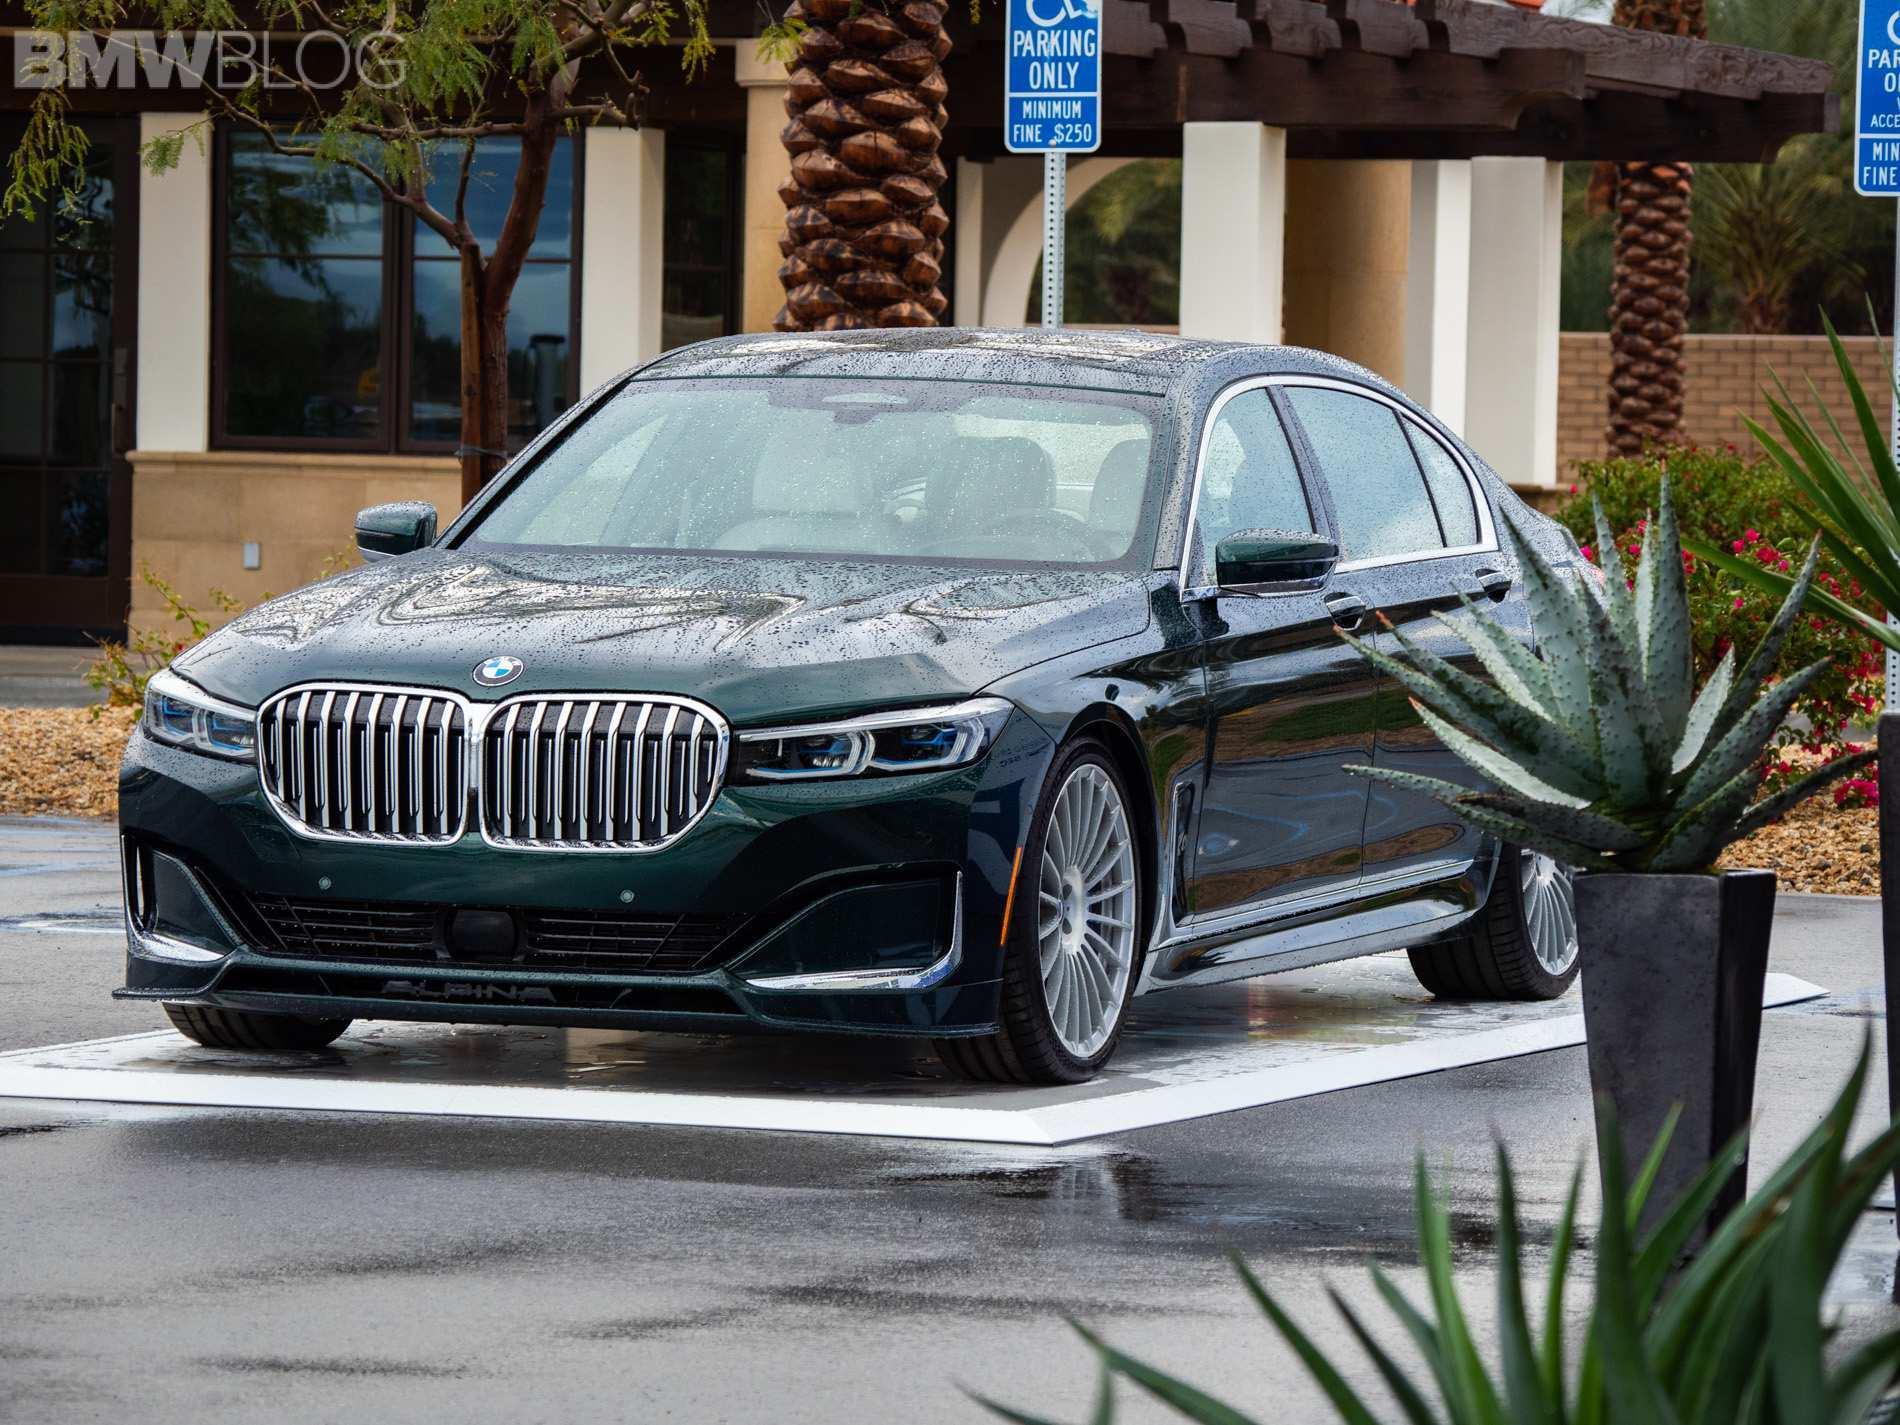 17 Gallery of BMW B7 Alpina 2020 Price Exterior with BMW B7 Alpina 2020 Price